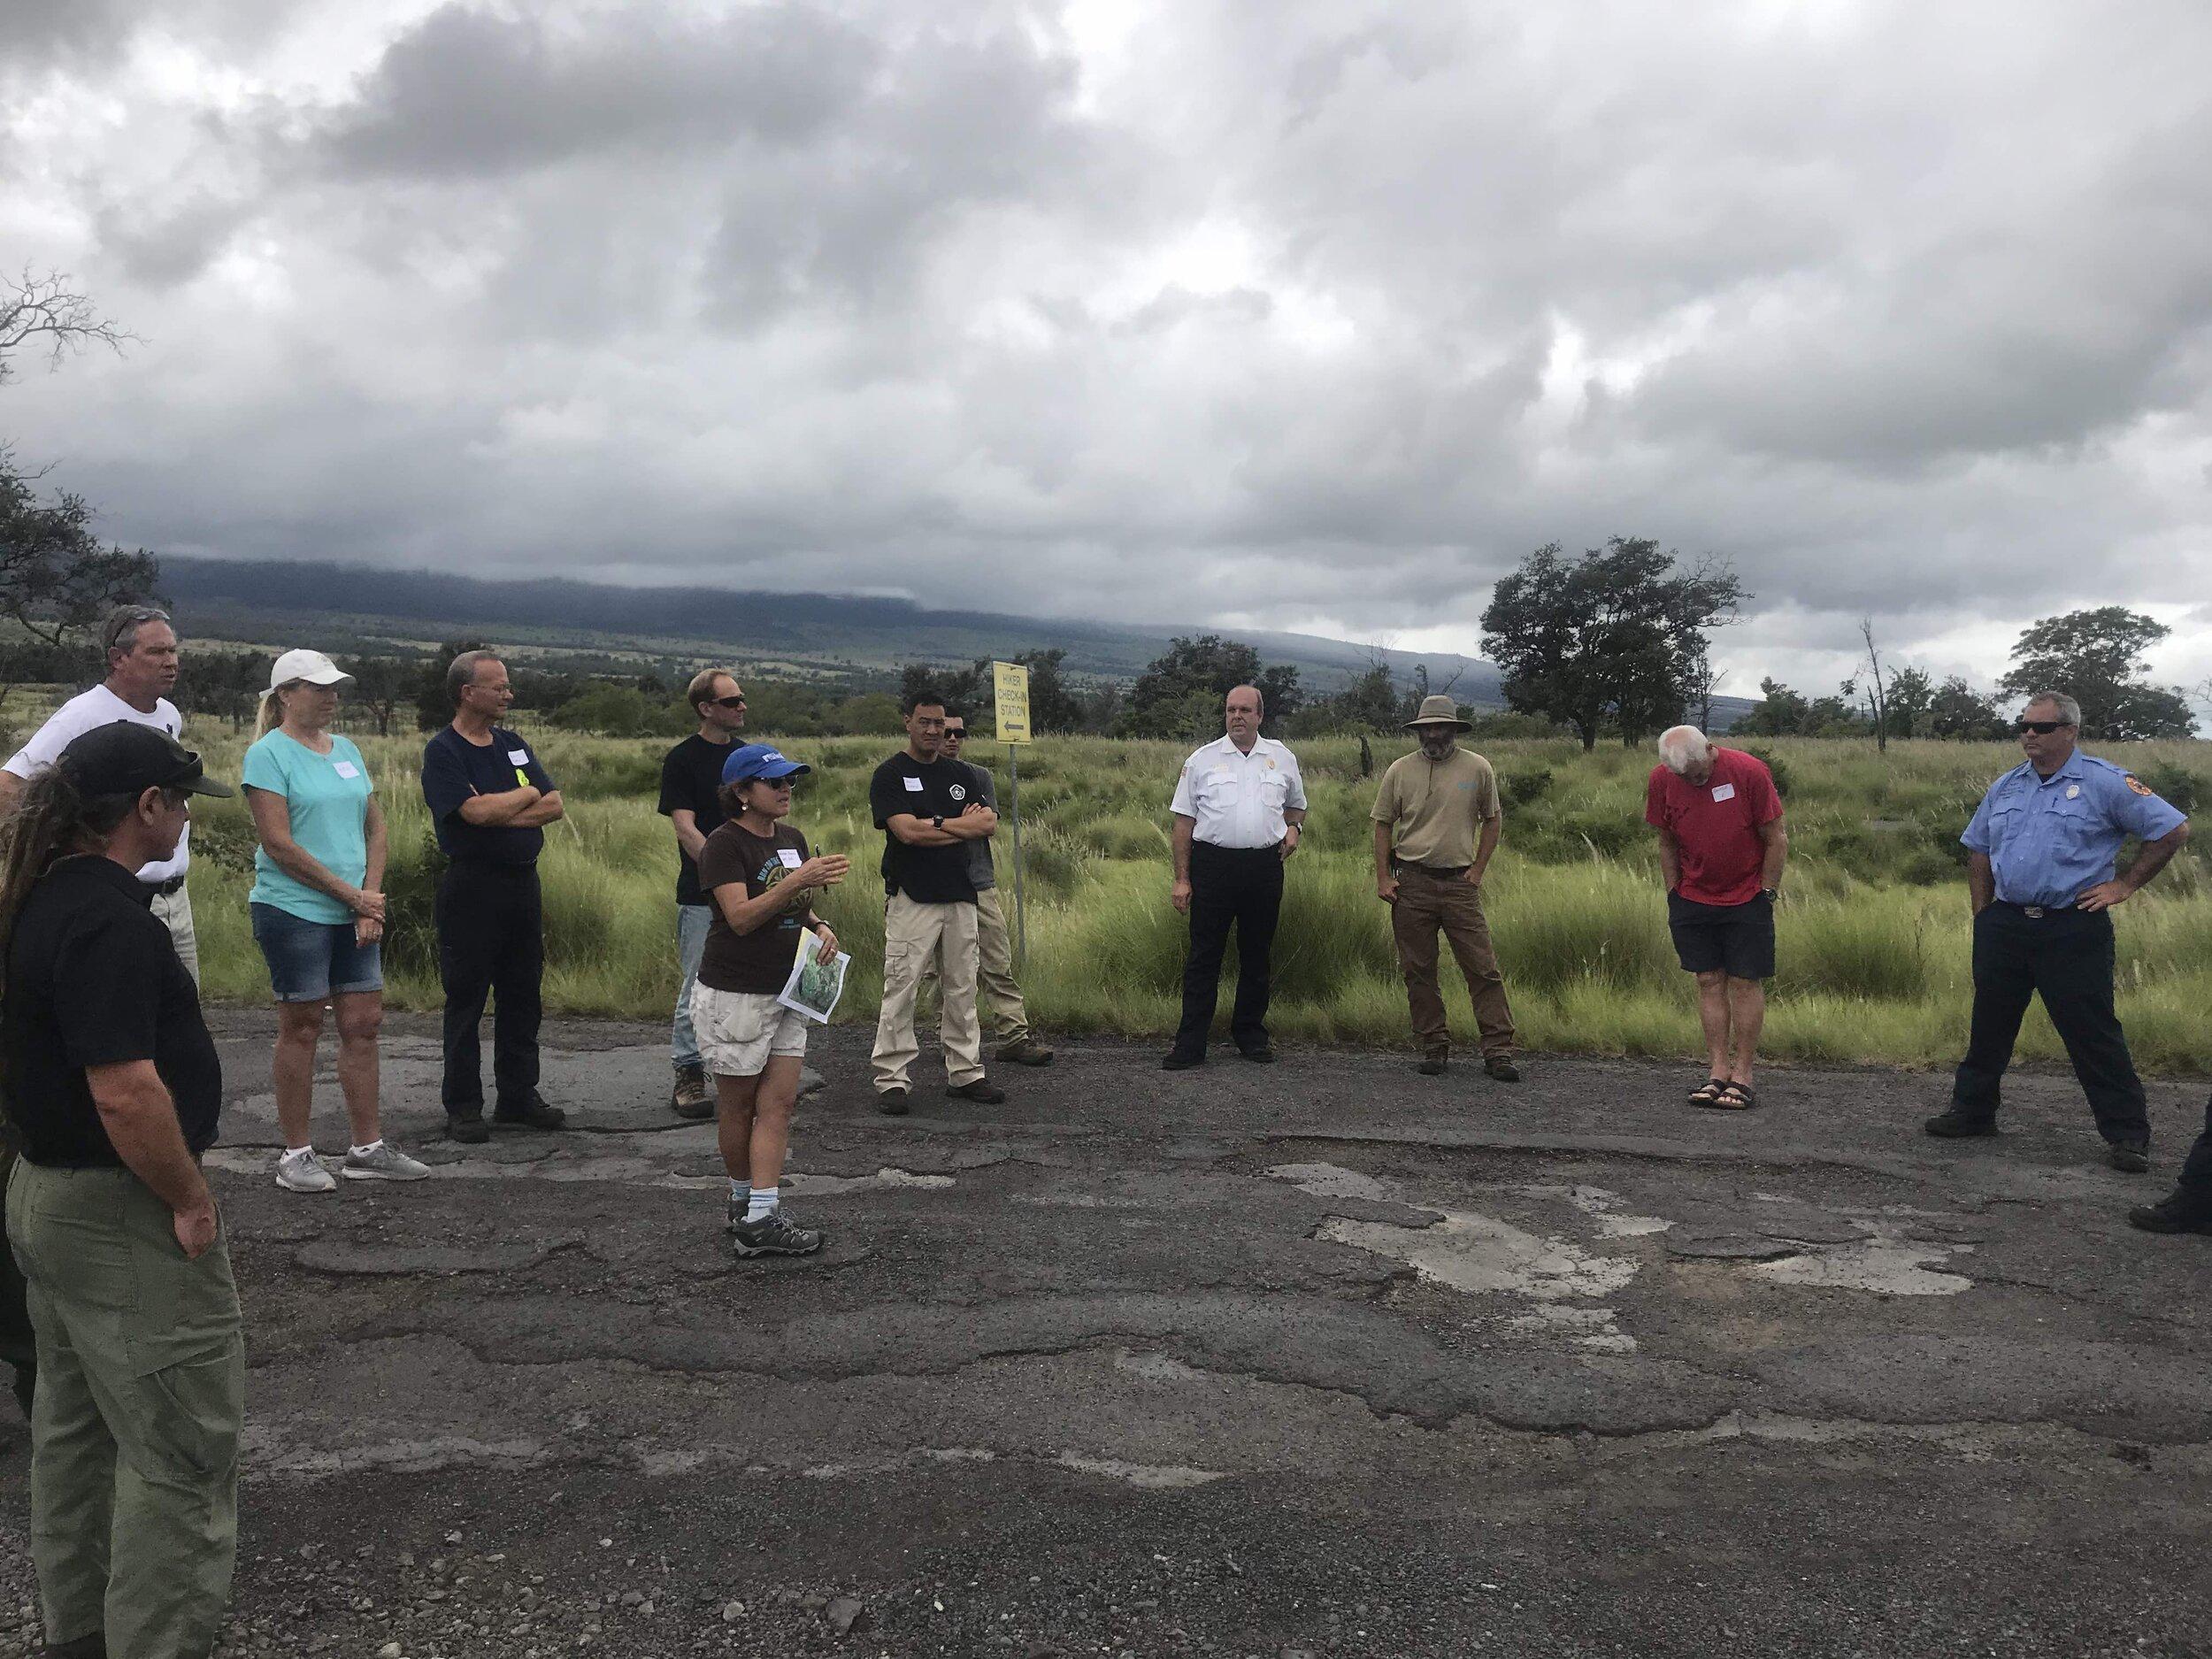 Wanda Rowan, Puʻu Anahulu Resident sharing her knowledge of wildfire in the area.